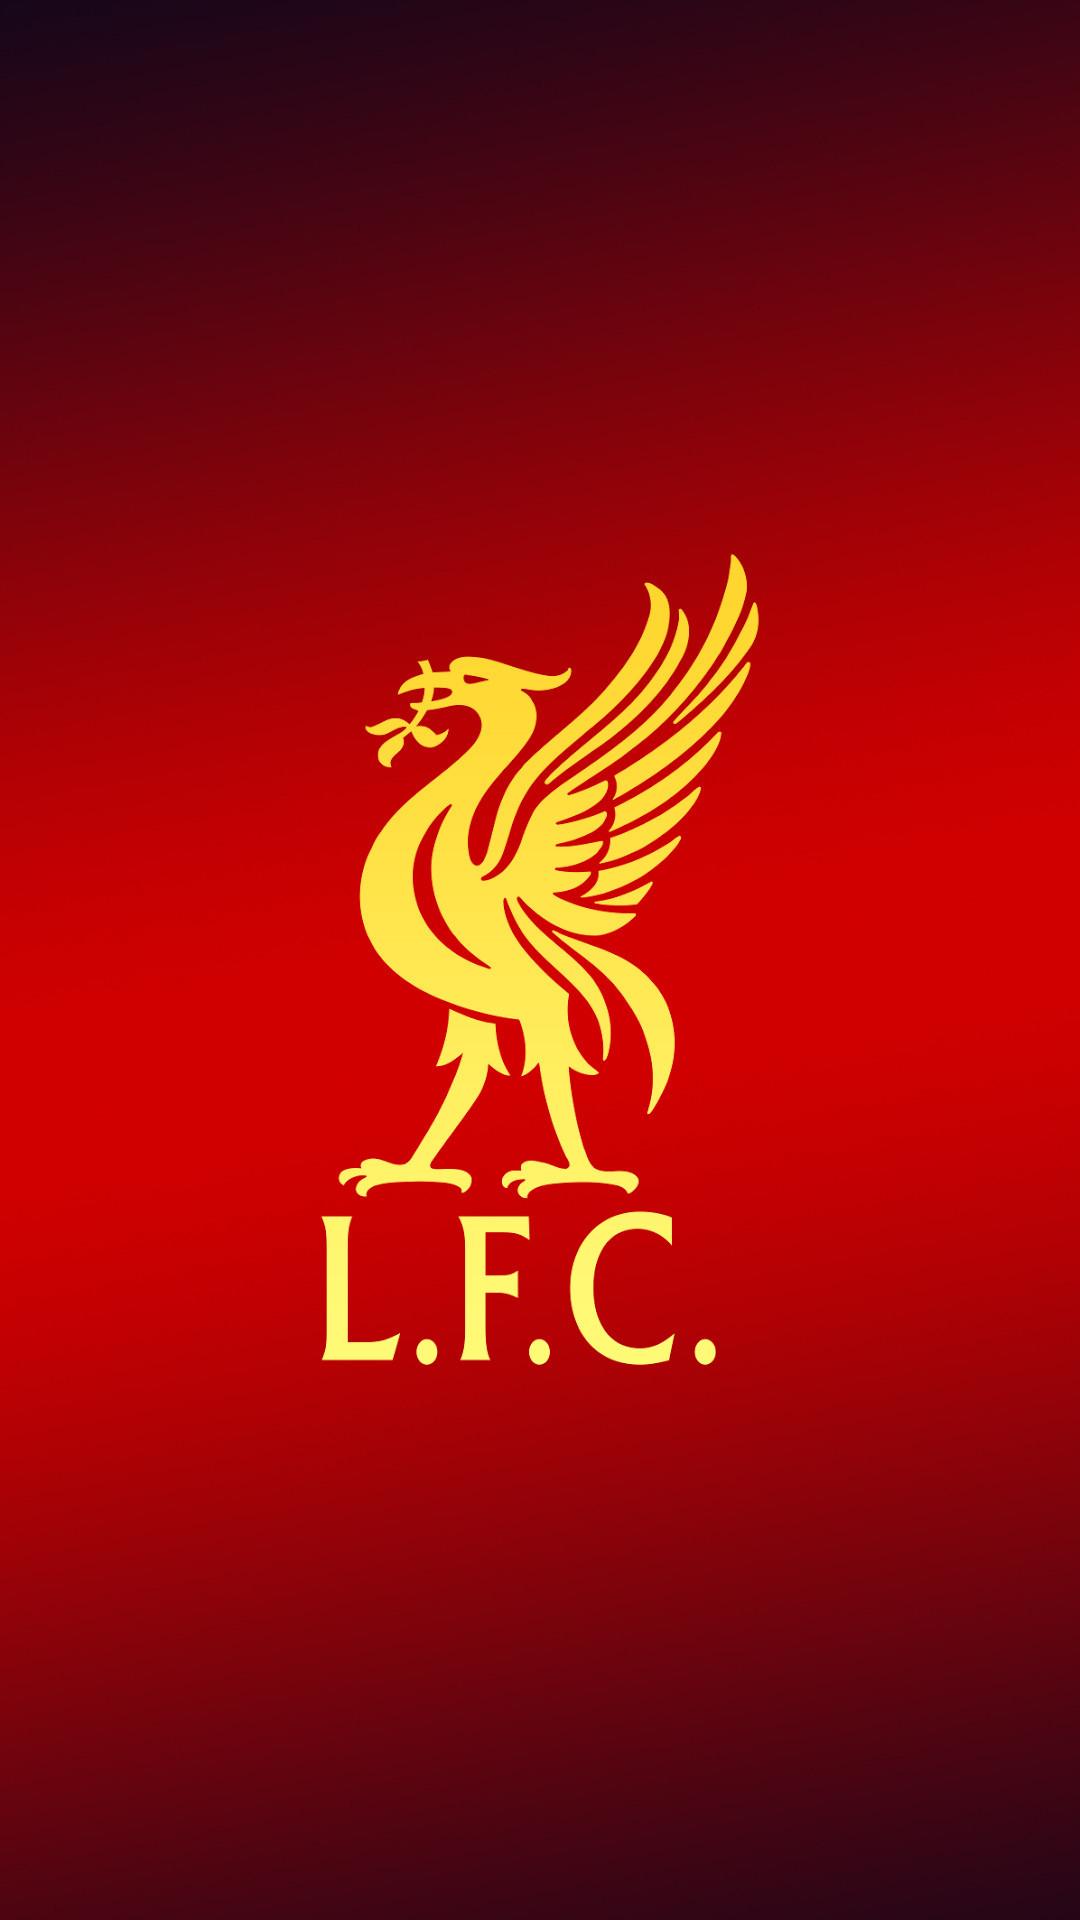 Liverpool Team Wallpaper 4k - Hd Football